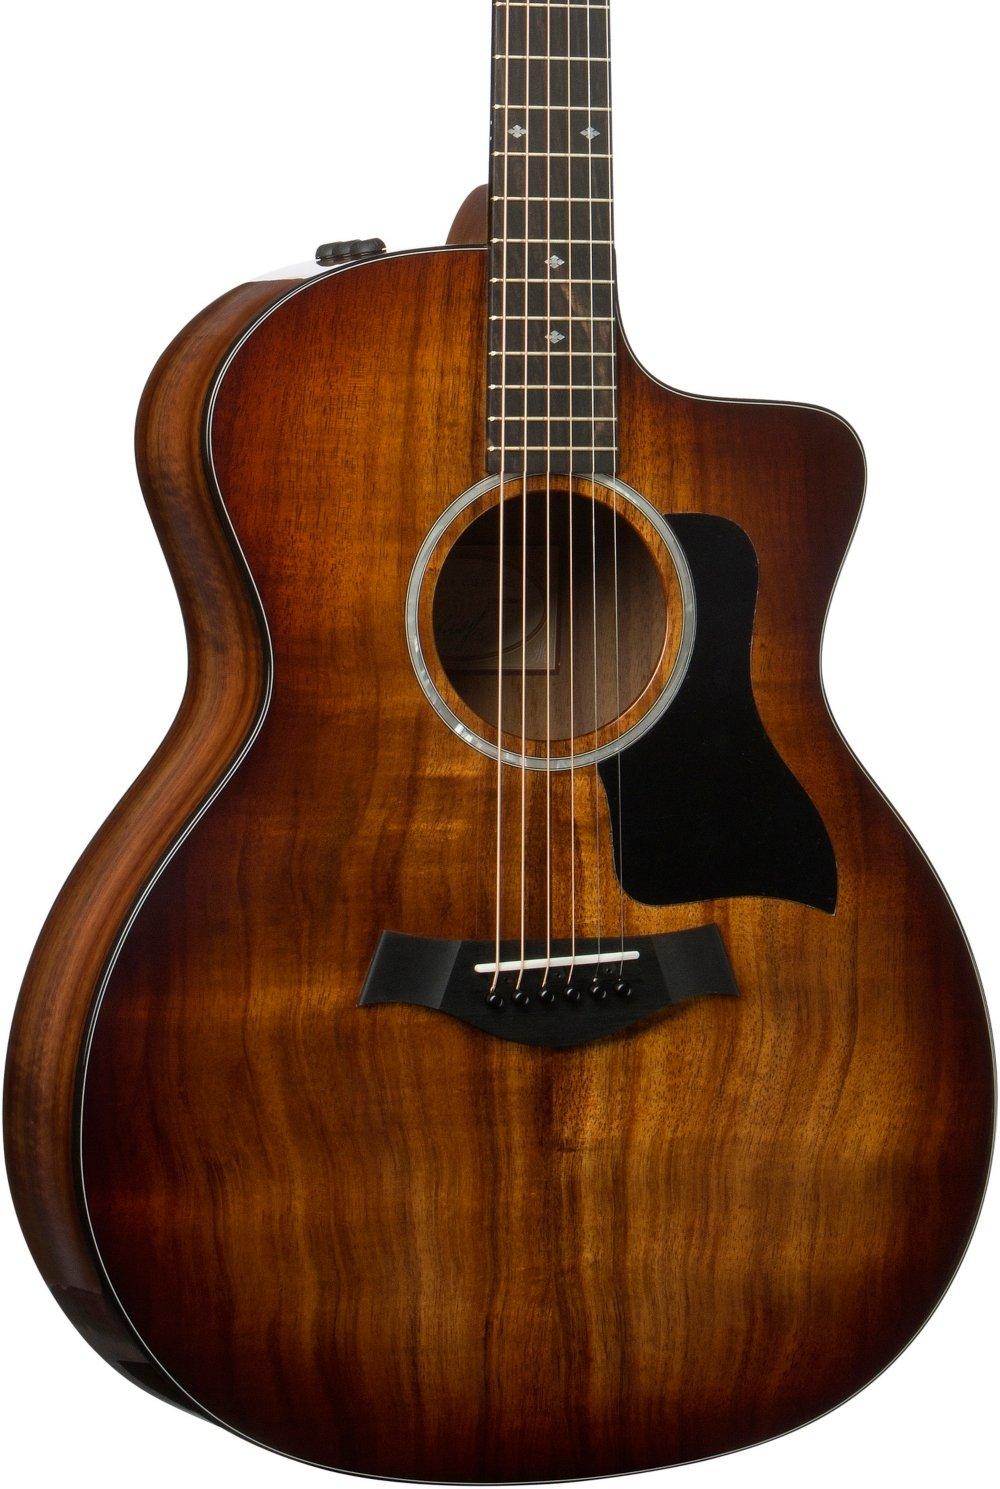 taylor 200 series deluxe 224ce k grand auditorium acoustic electric guitar guitar affinity. Black Bedroom Furniture Sets. Home Design Ideas